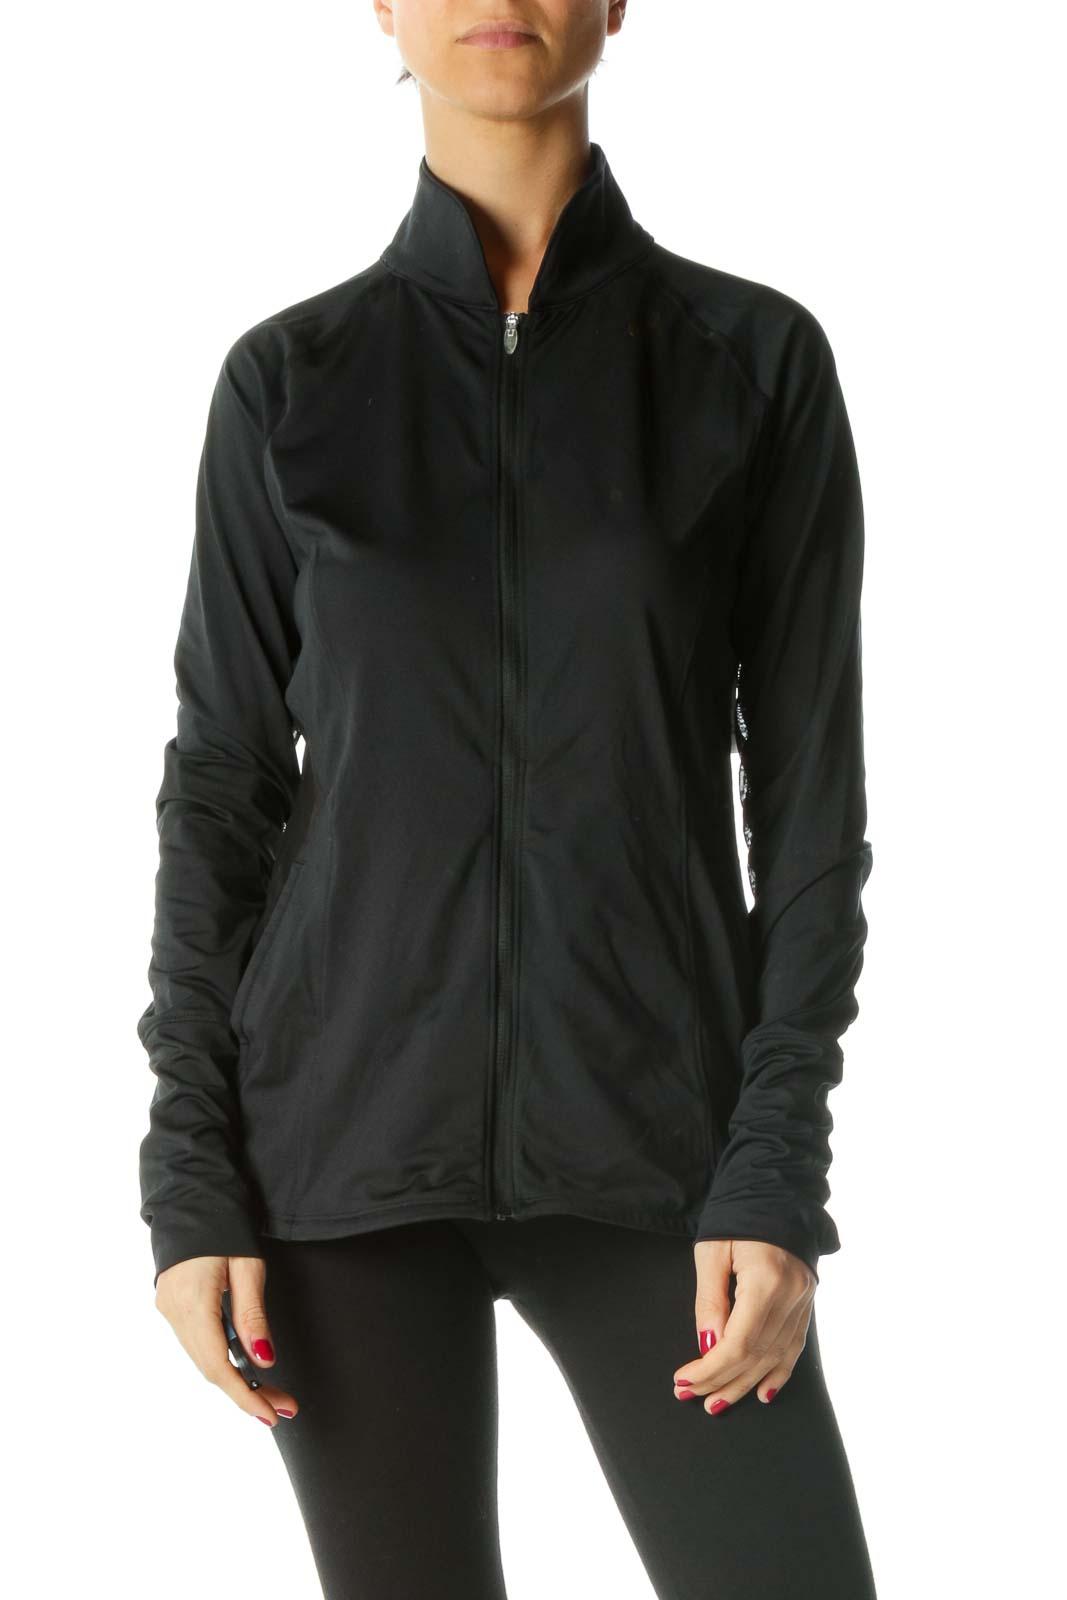 Black Zippered Sheer Detail Active Jacket